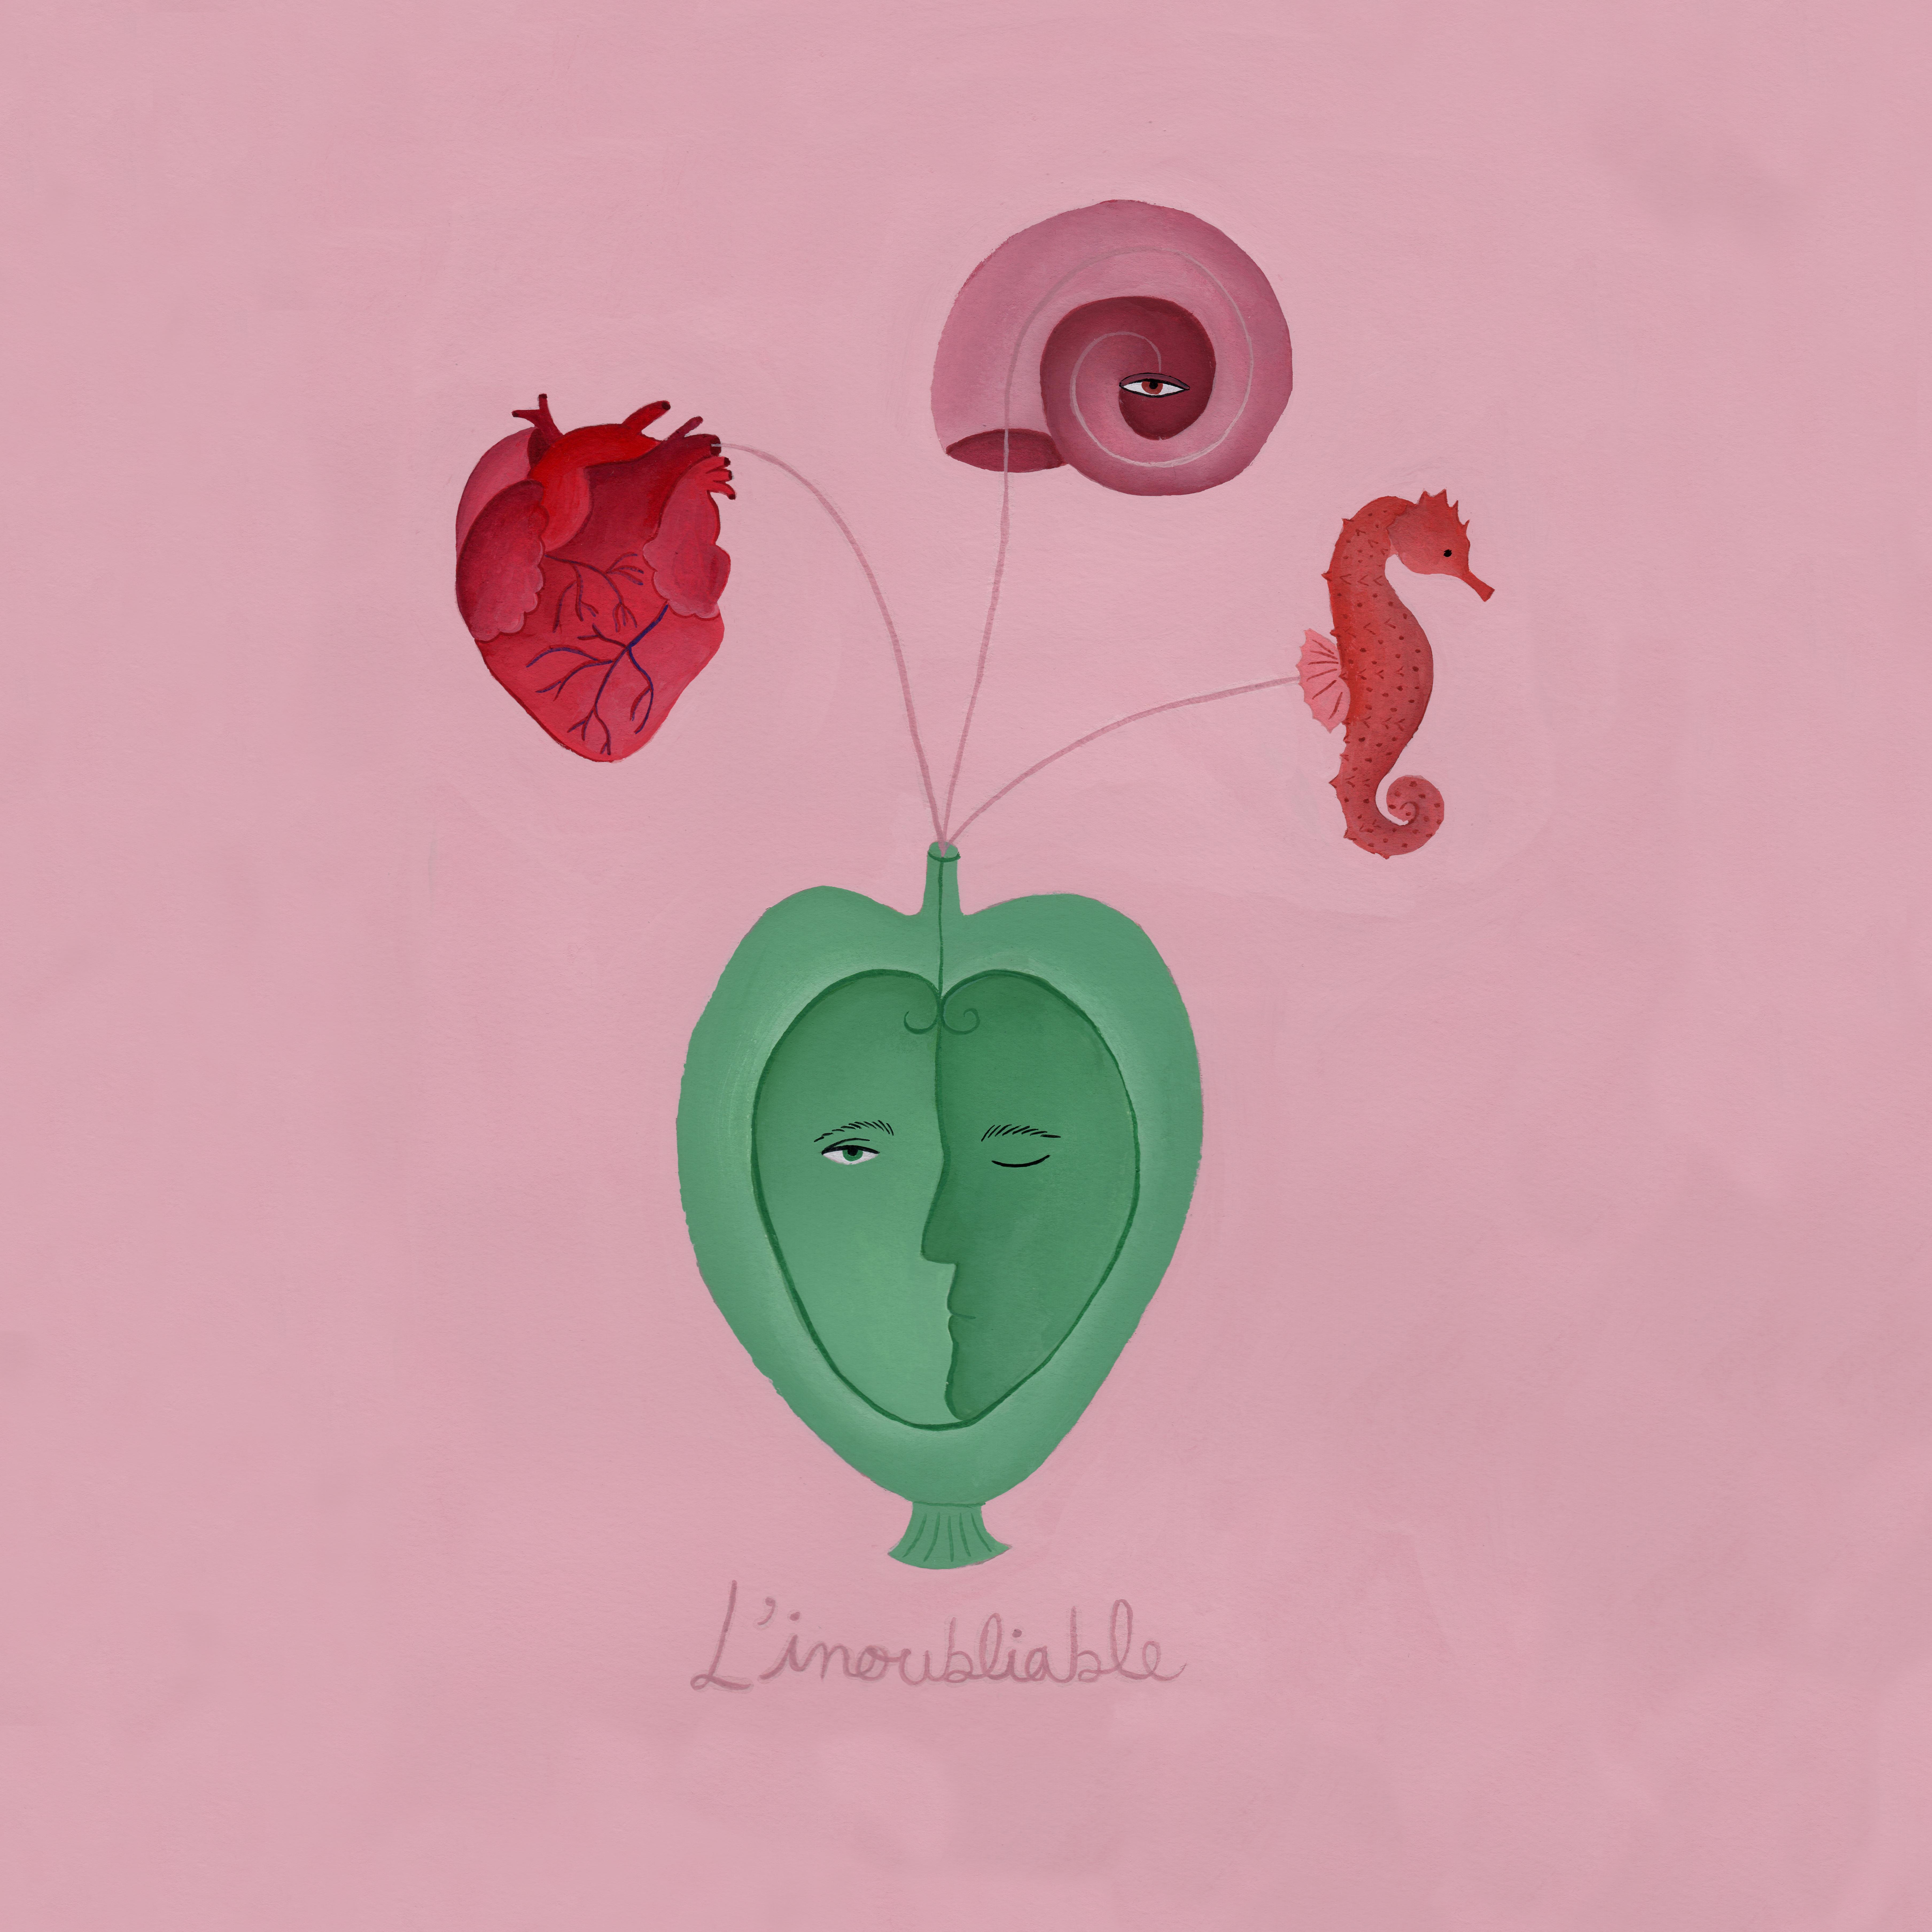 L'inoubliable by Isabelle Feliu